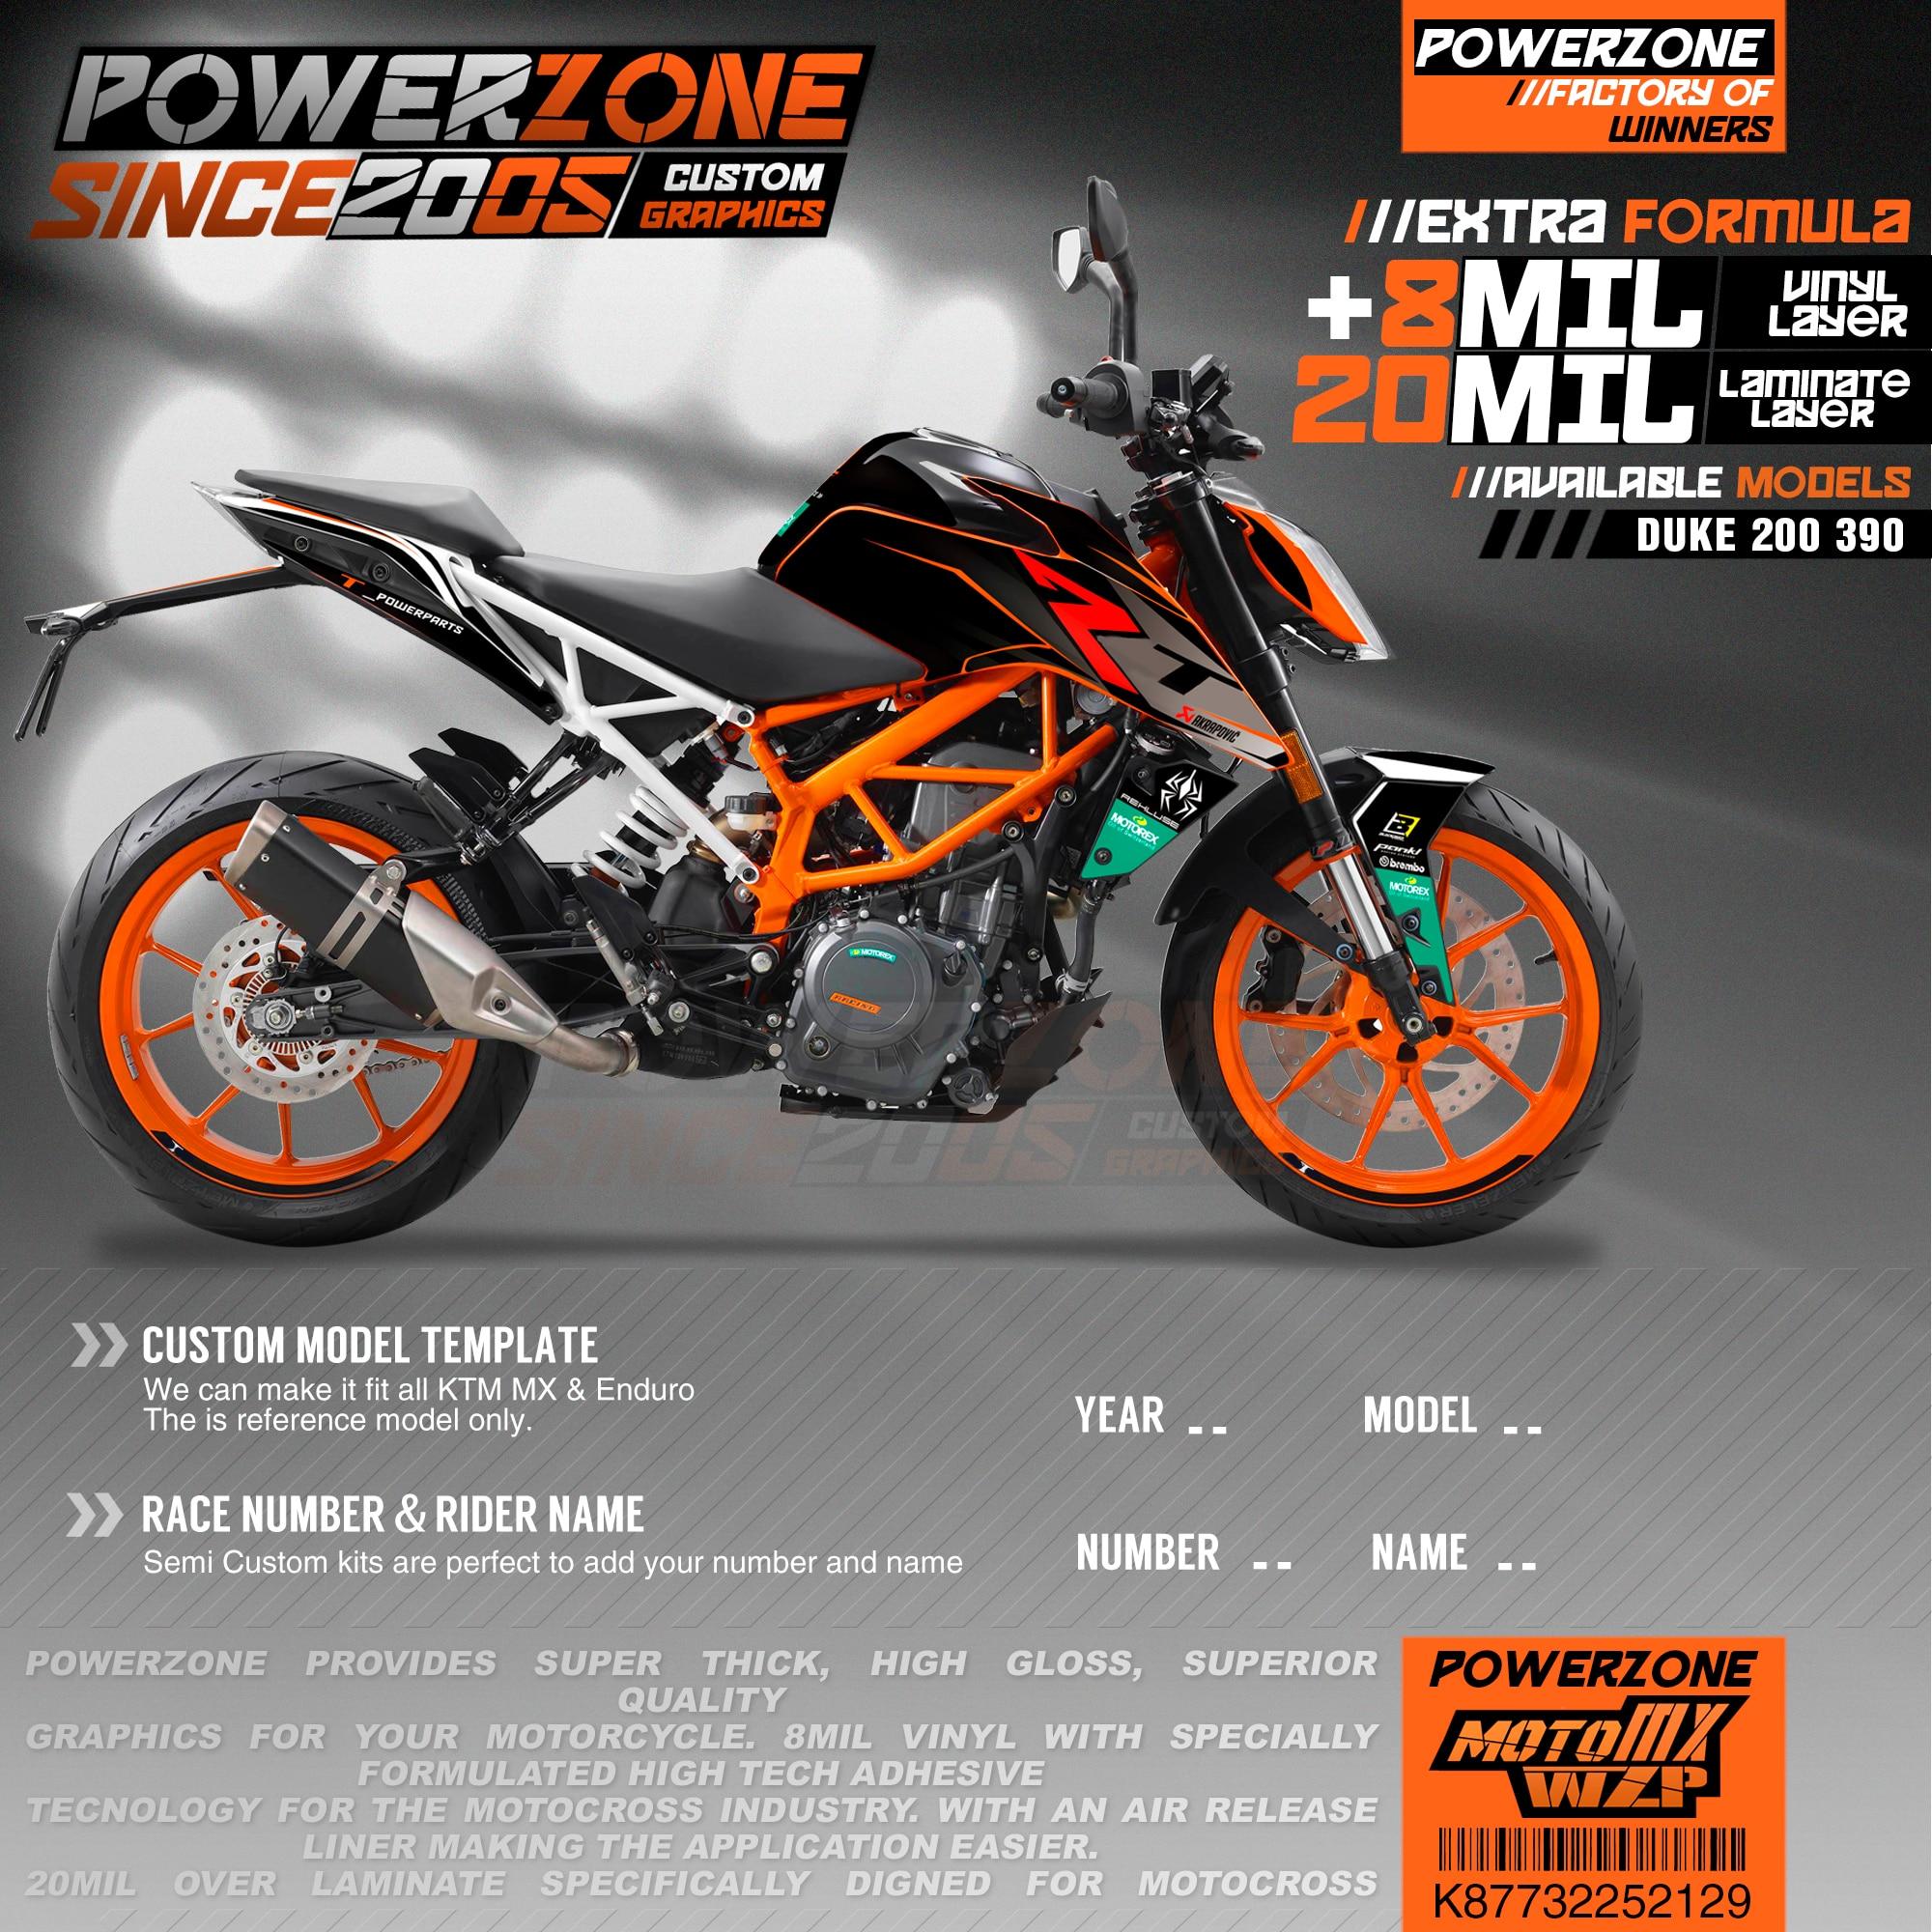 PowerZone-ملصقات فريق مخصصة ، مجموعة ملصقات 3 متر لـ KTM DUKE 200 390 2011-2016 2017-2019 129